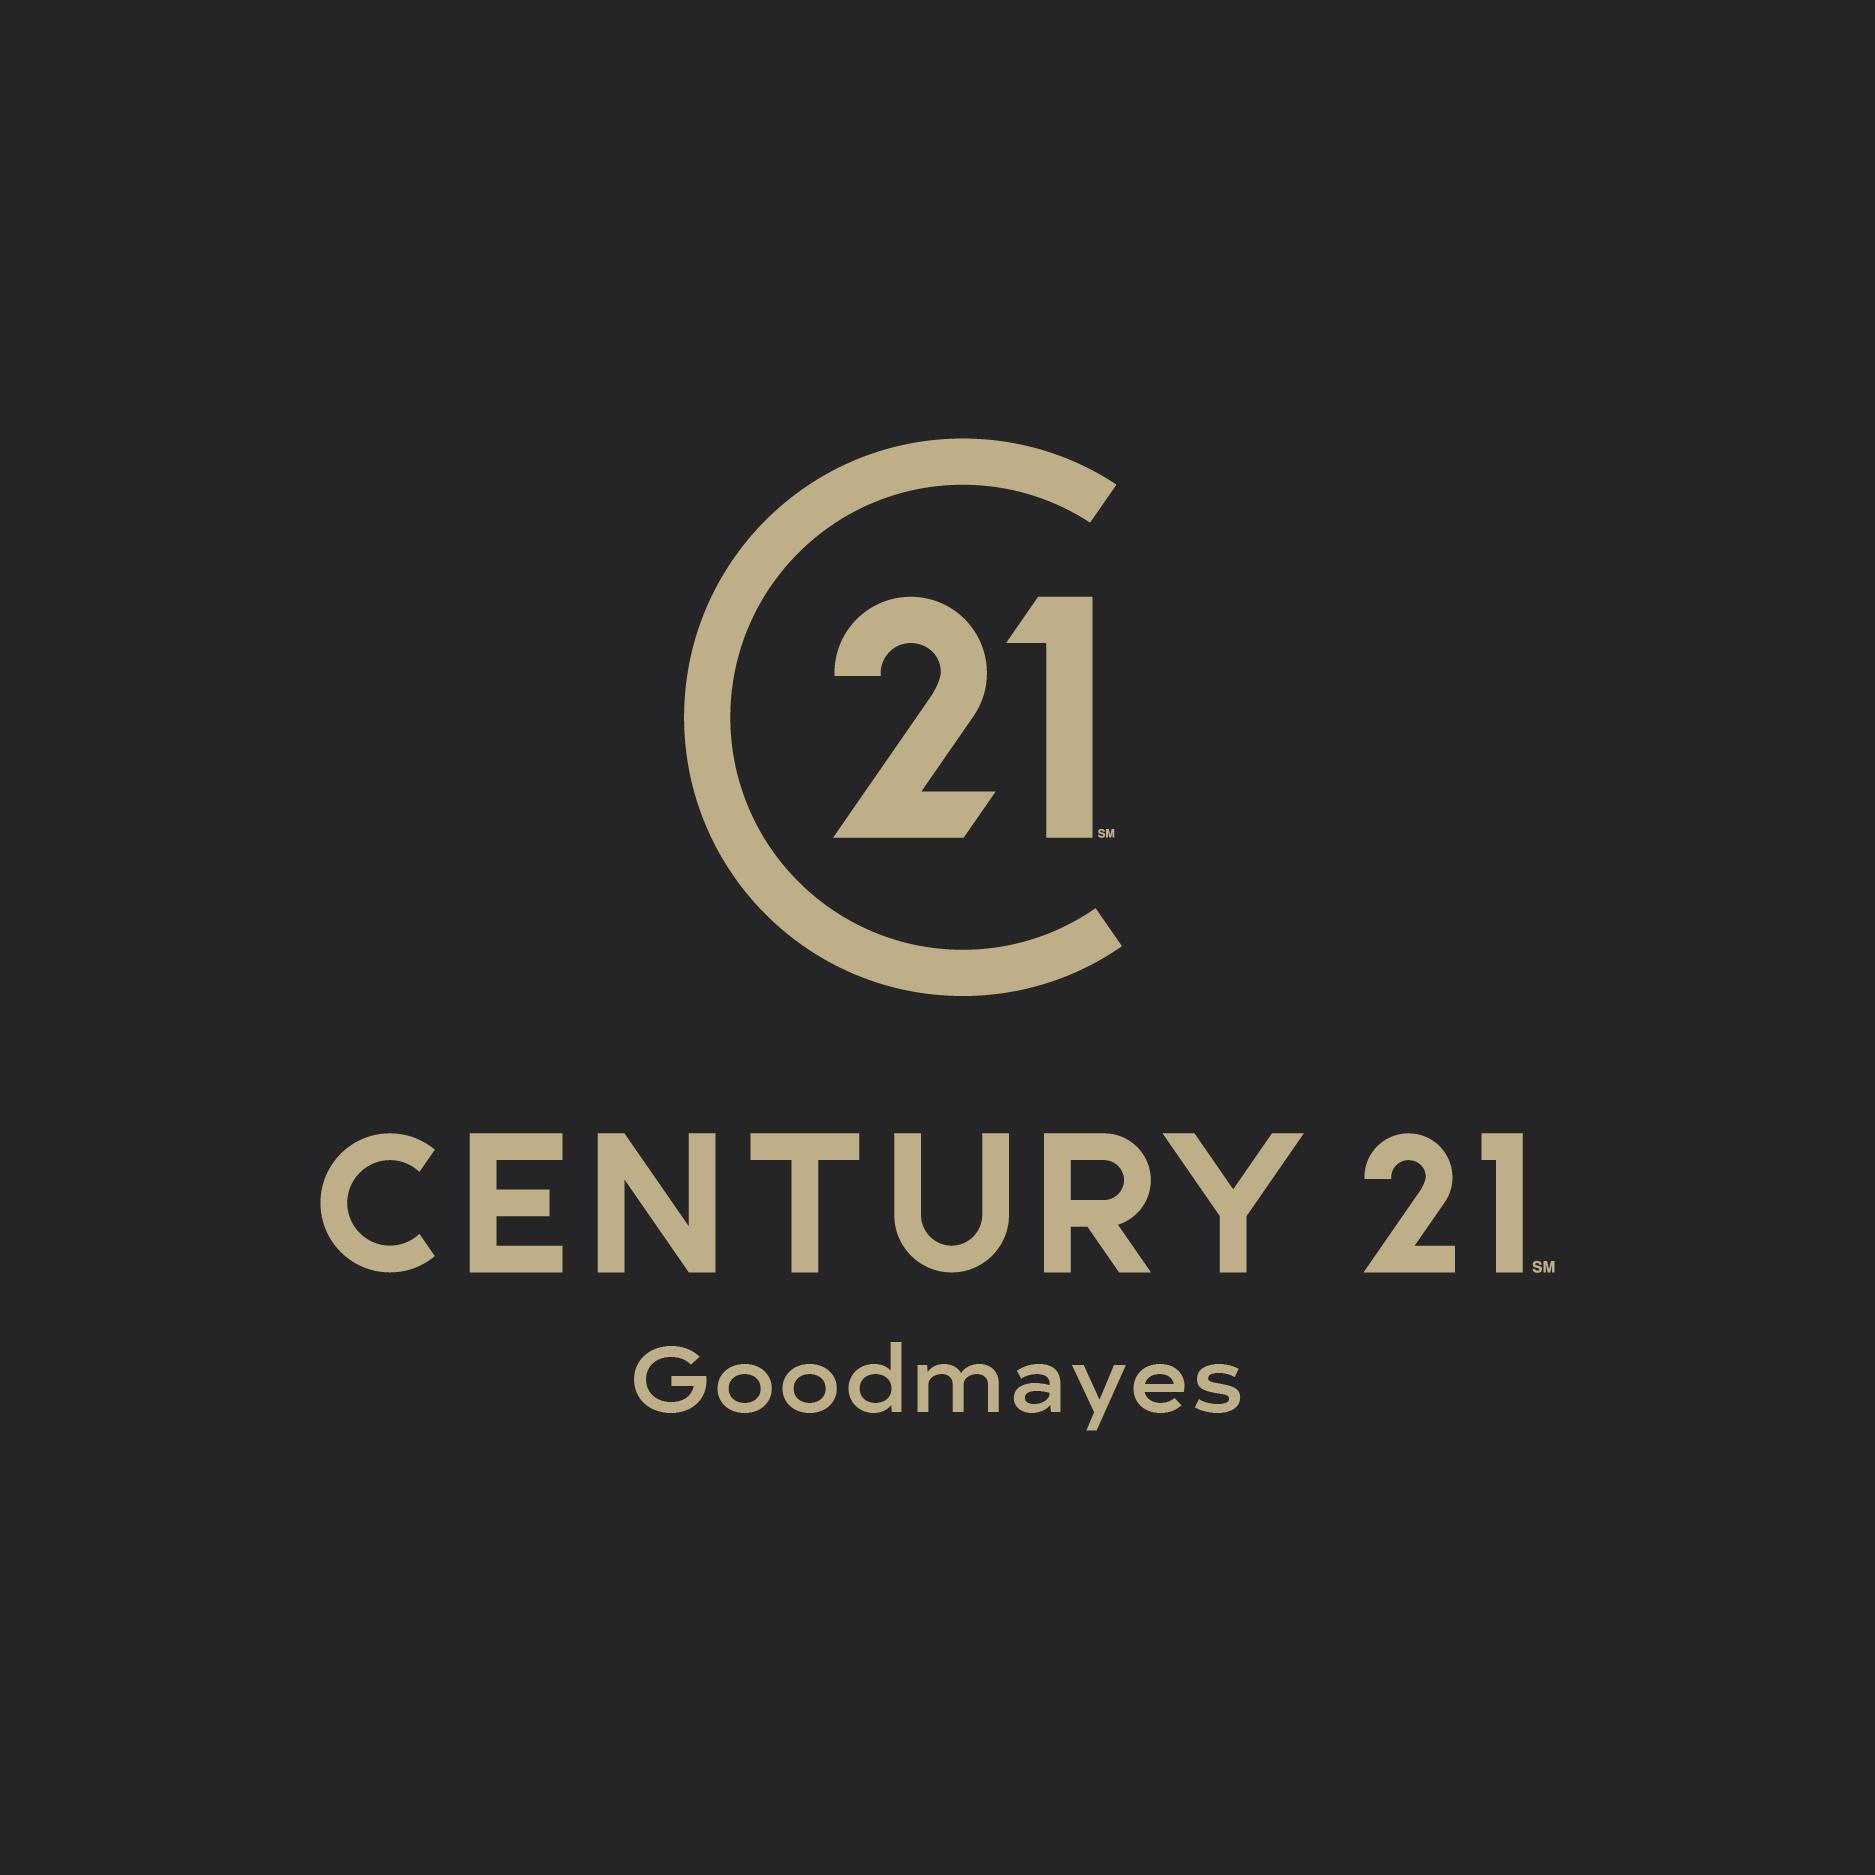 Century 21 - Goodmayes